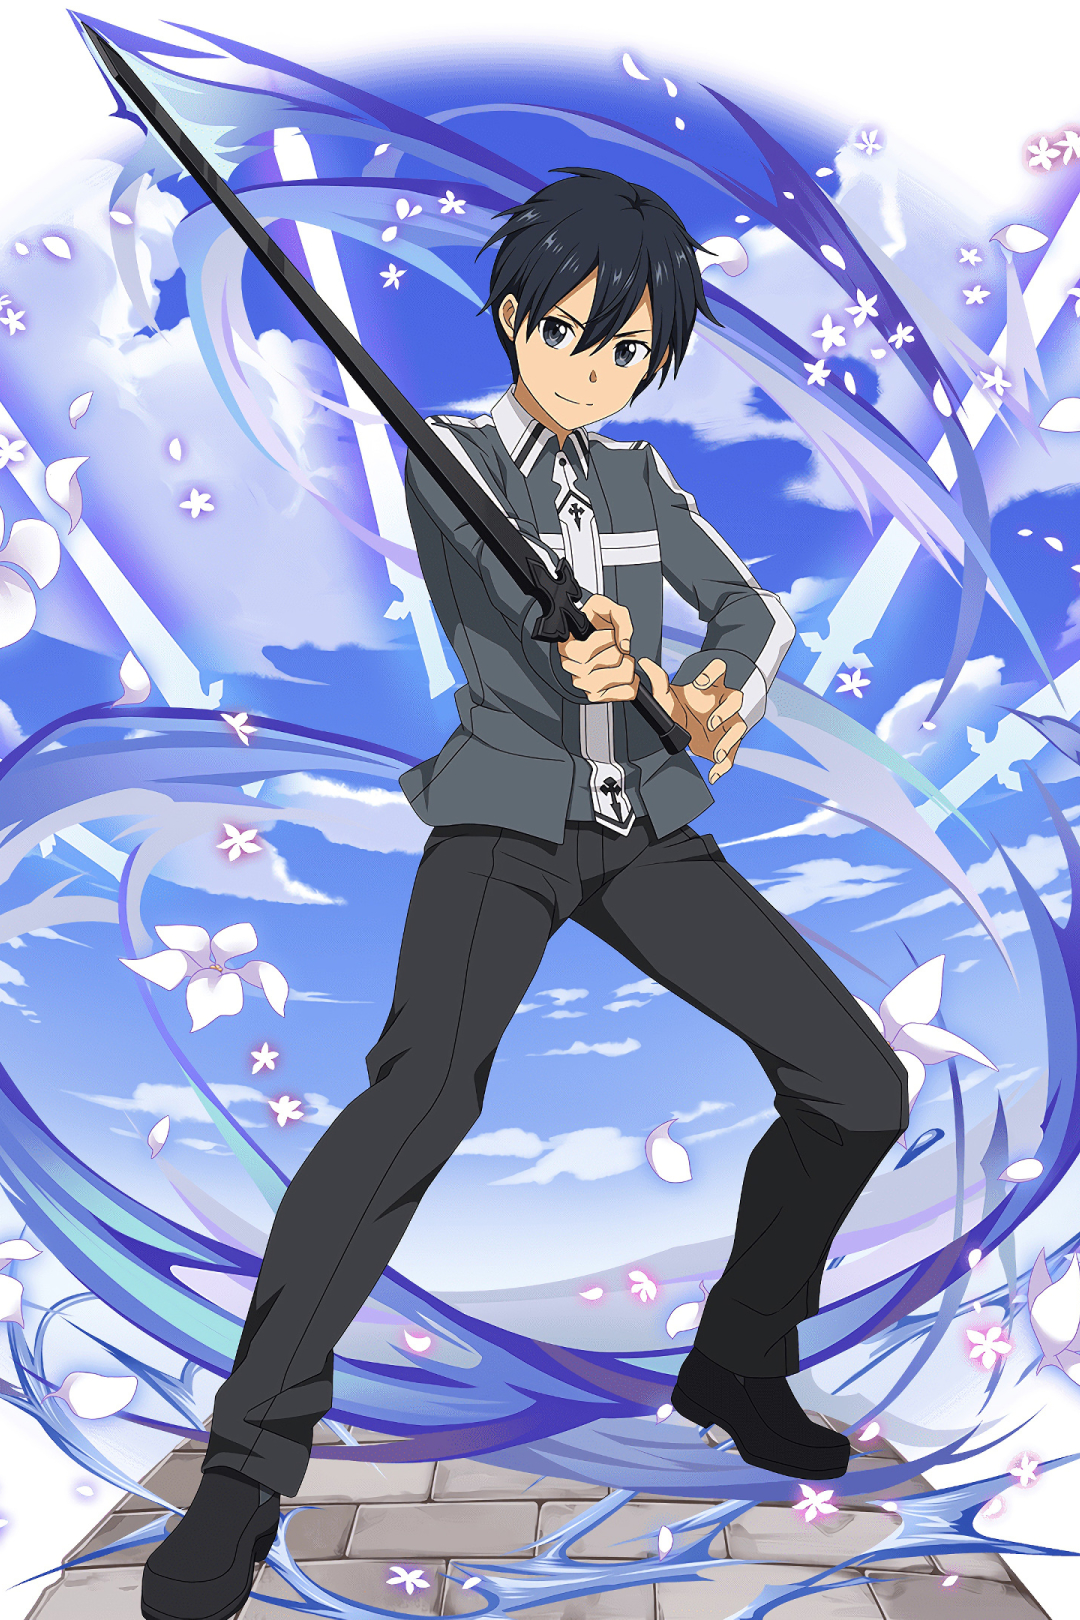 1080x1620 Kirito In Sword Art Online 1080x1620 Resolution